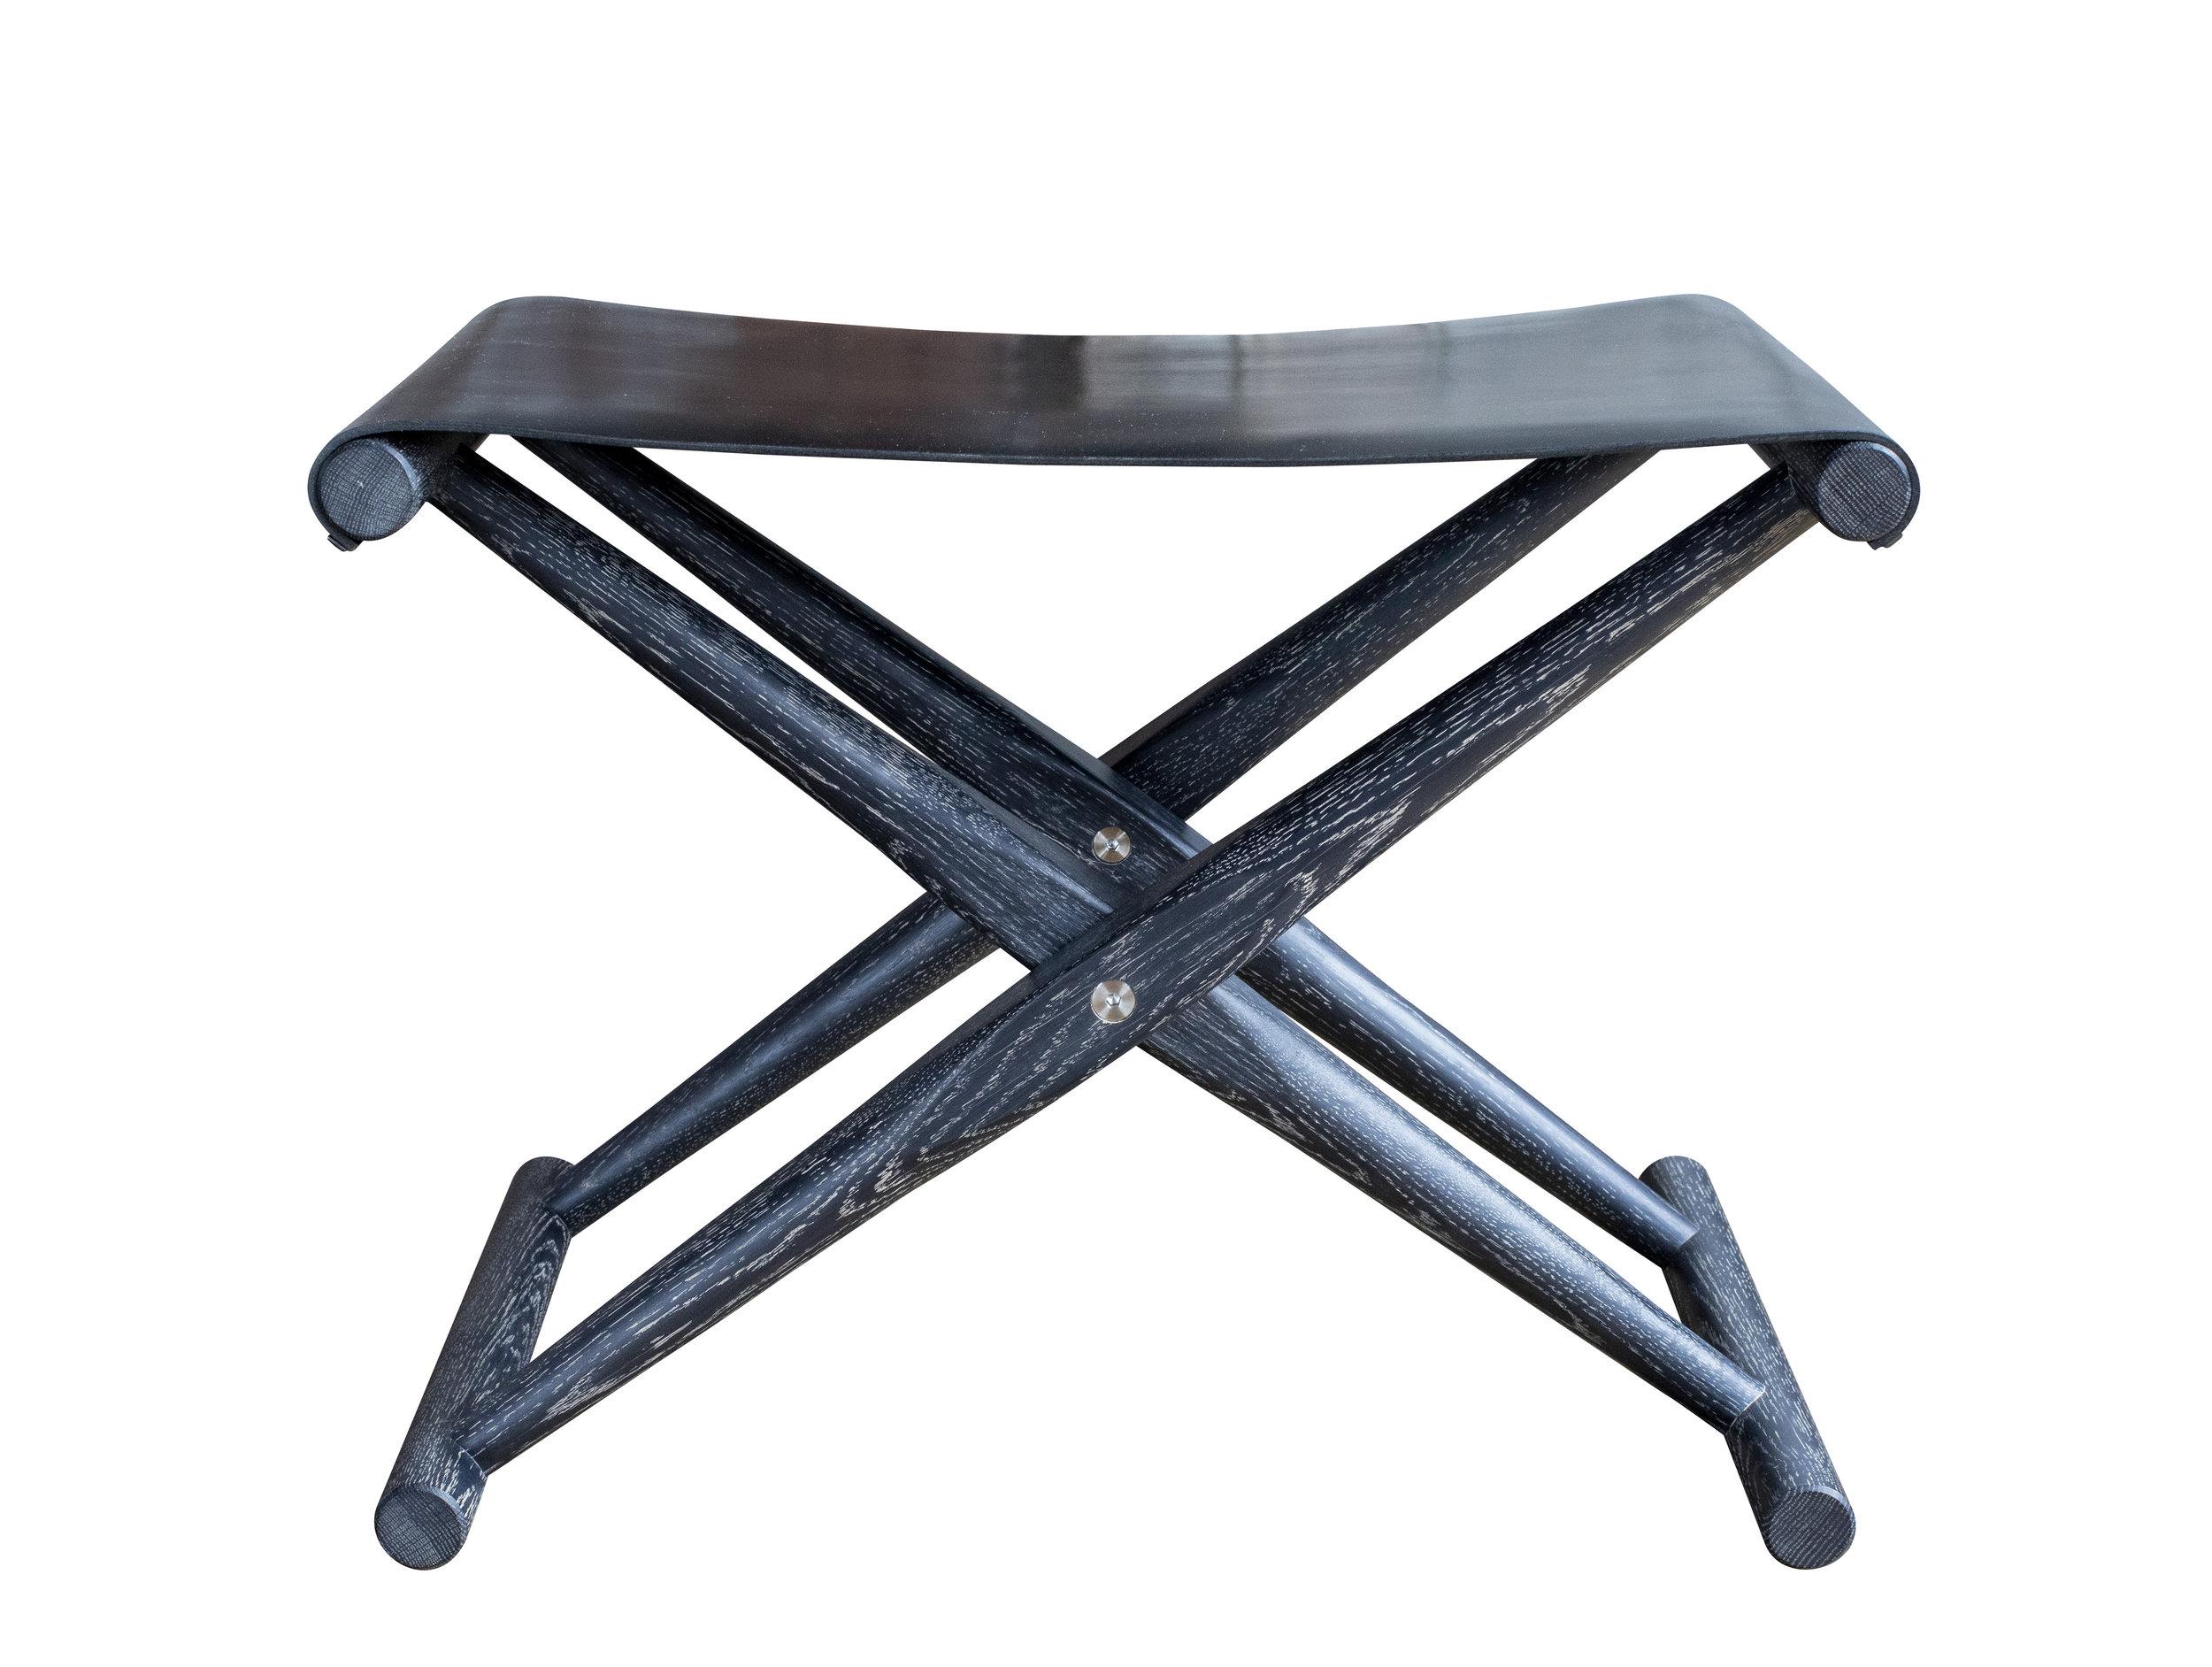 Matthiessen Folding Stool - New Leg Option